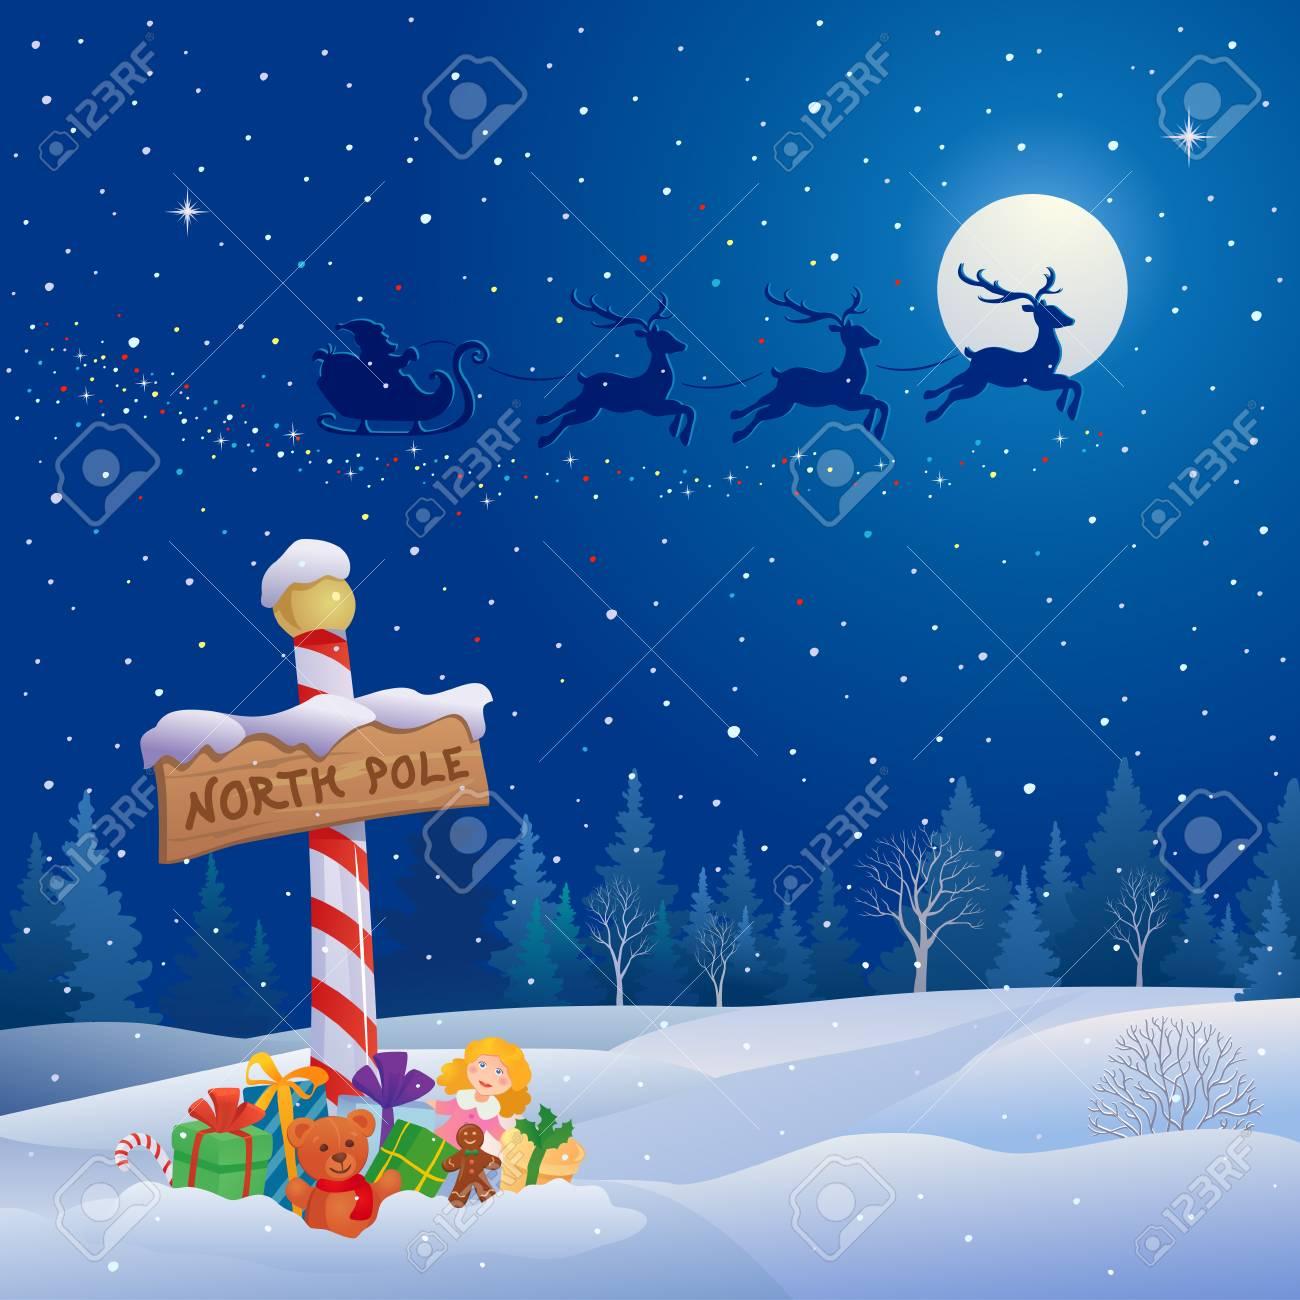 Vector illustration of Santa Claus sleigh - 89991828